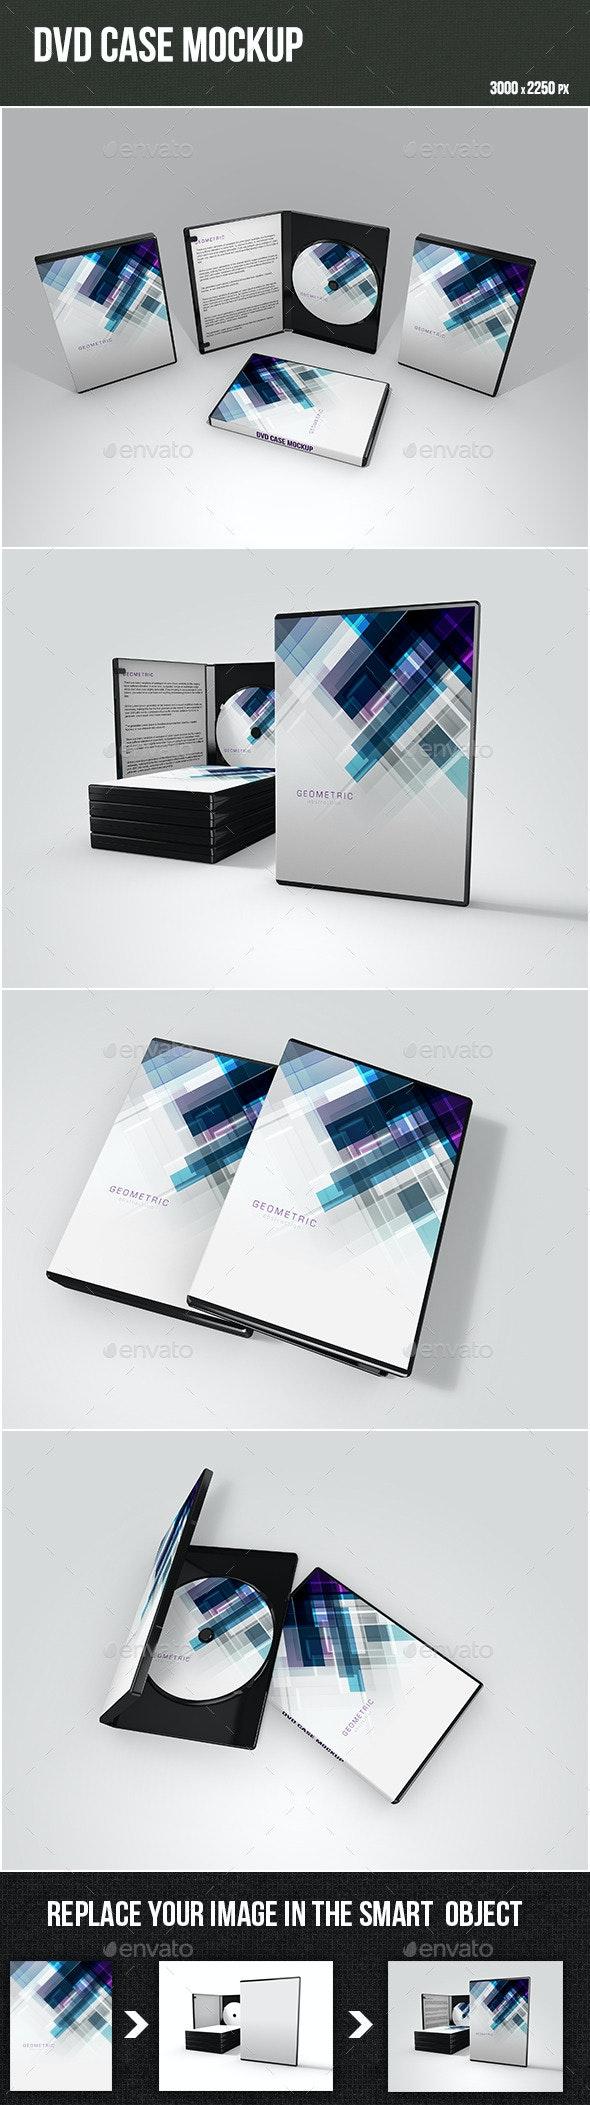 DVD Case Mockup - Product Mock-Ups Graphics